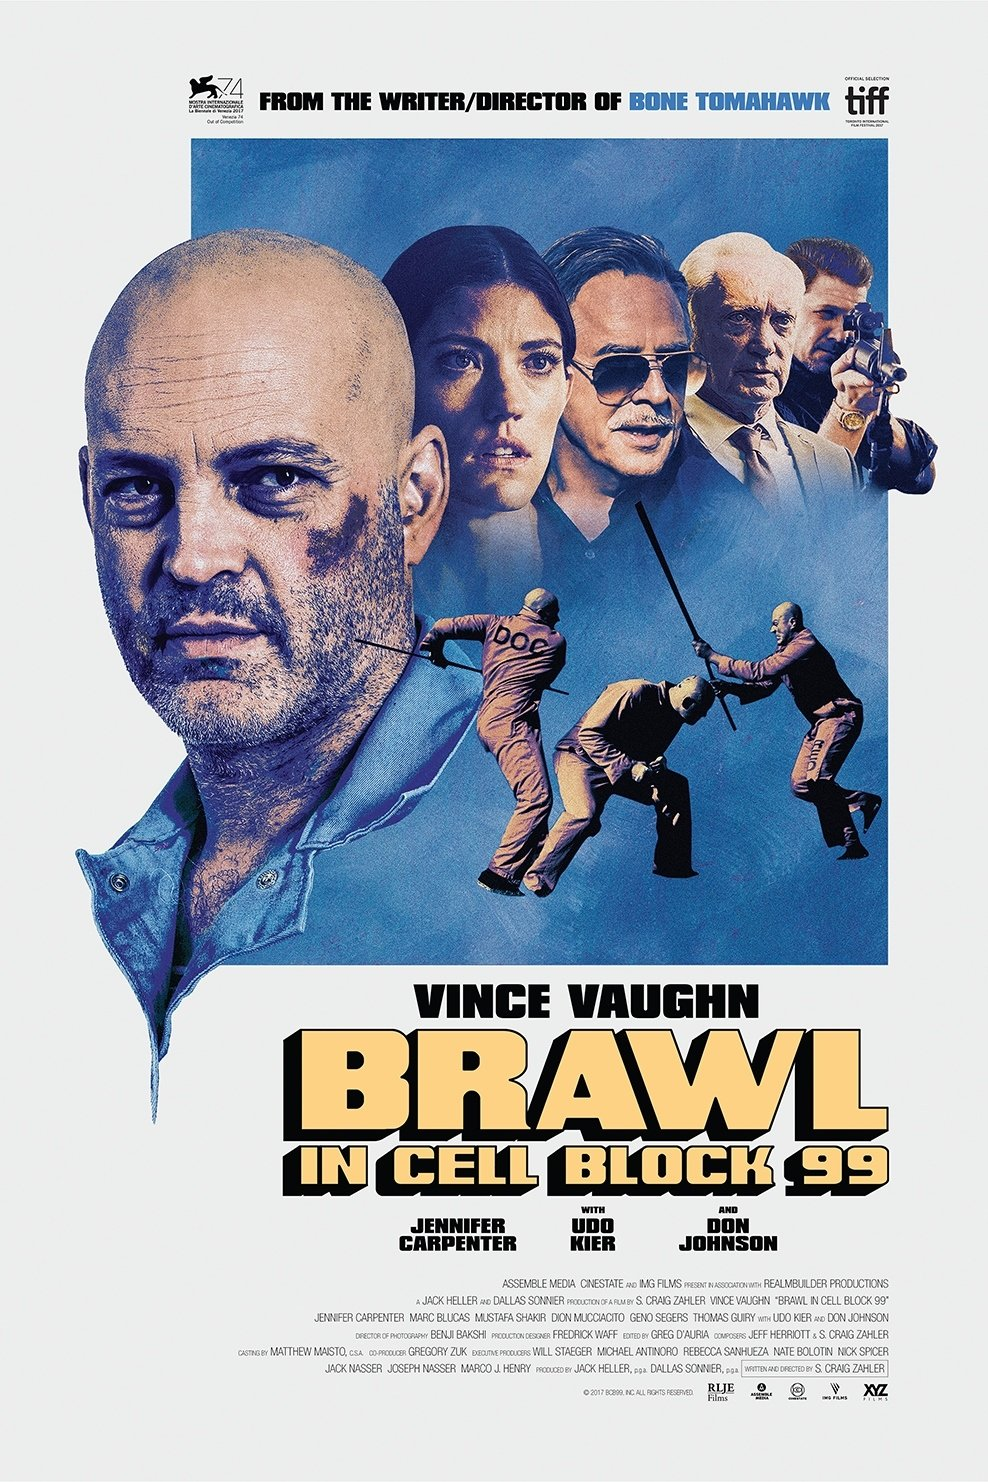 affiche du film Brawl in Cell Block 99